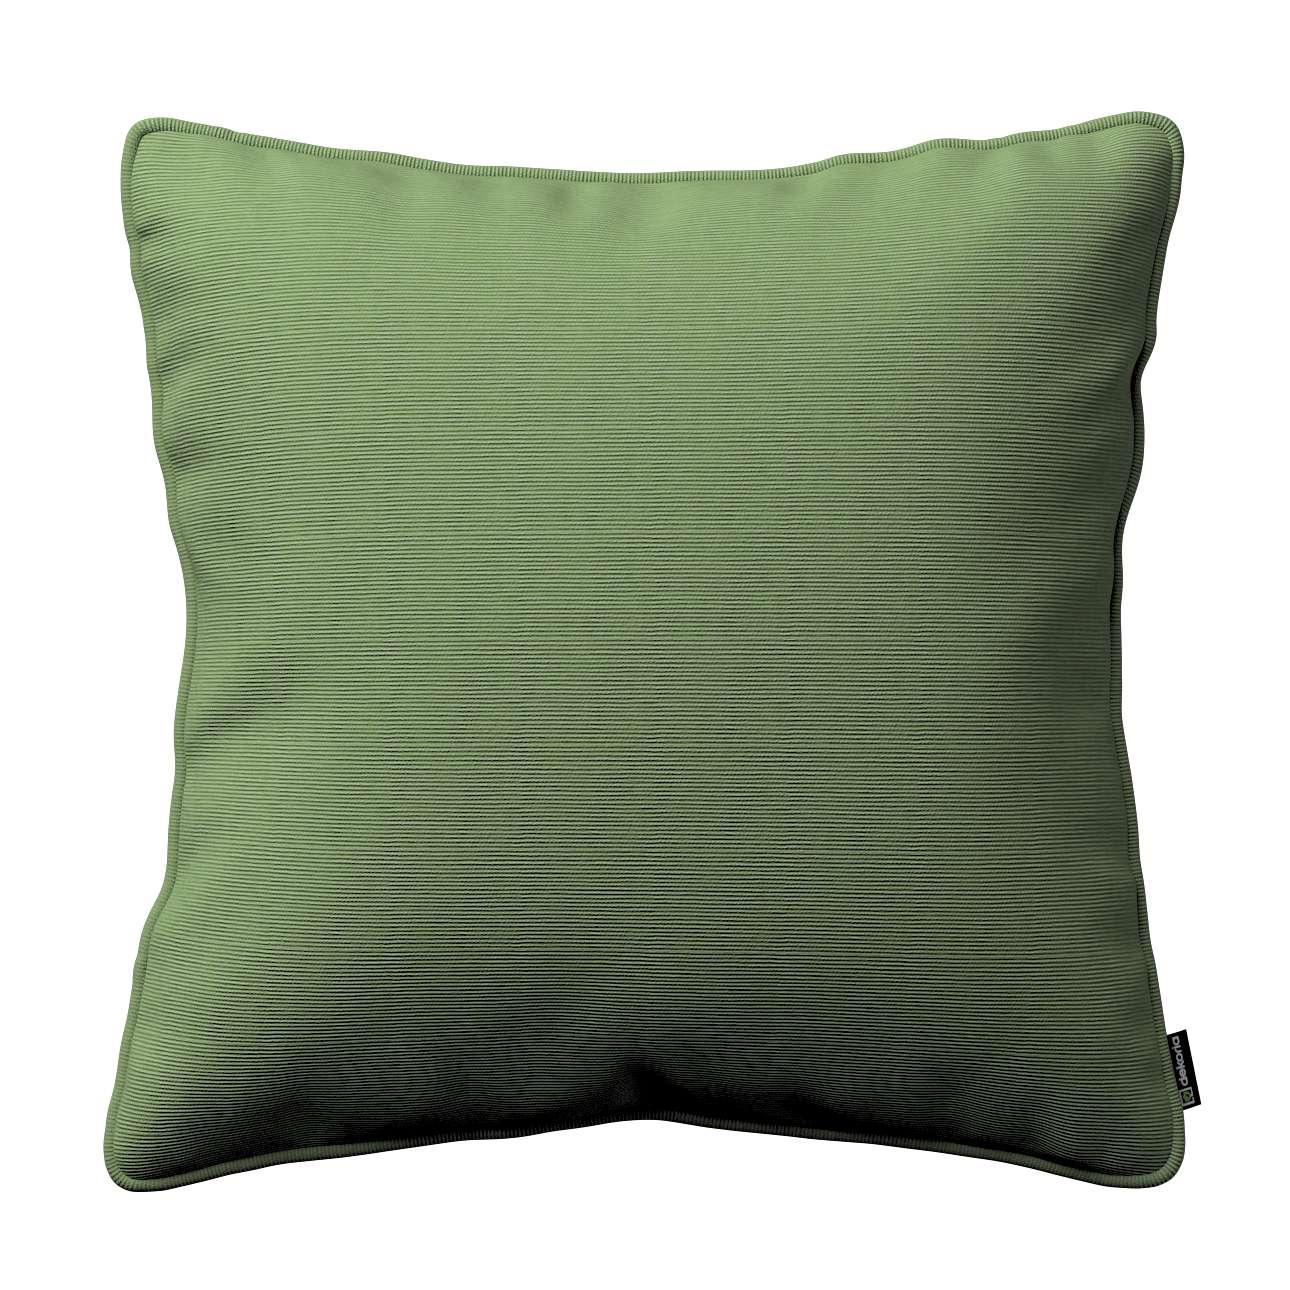 Poszewka Gabi na poduszkę 45 x 45 cm w kolekcji Jupiter, tkanina: 127-52